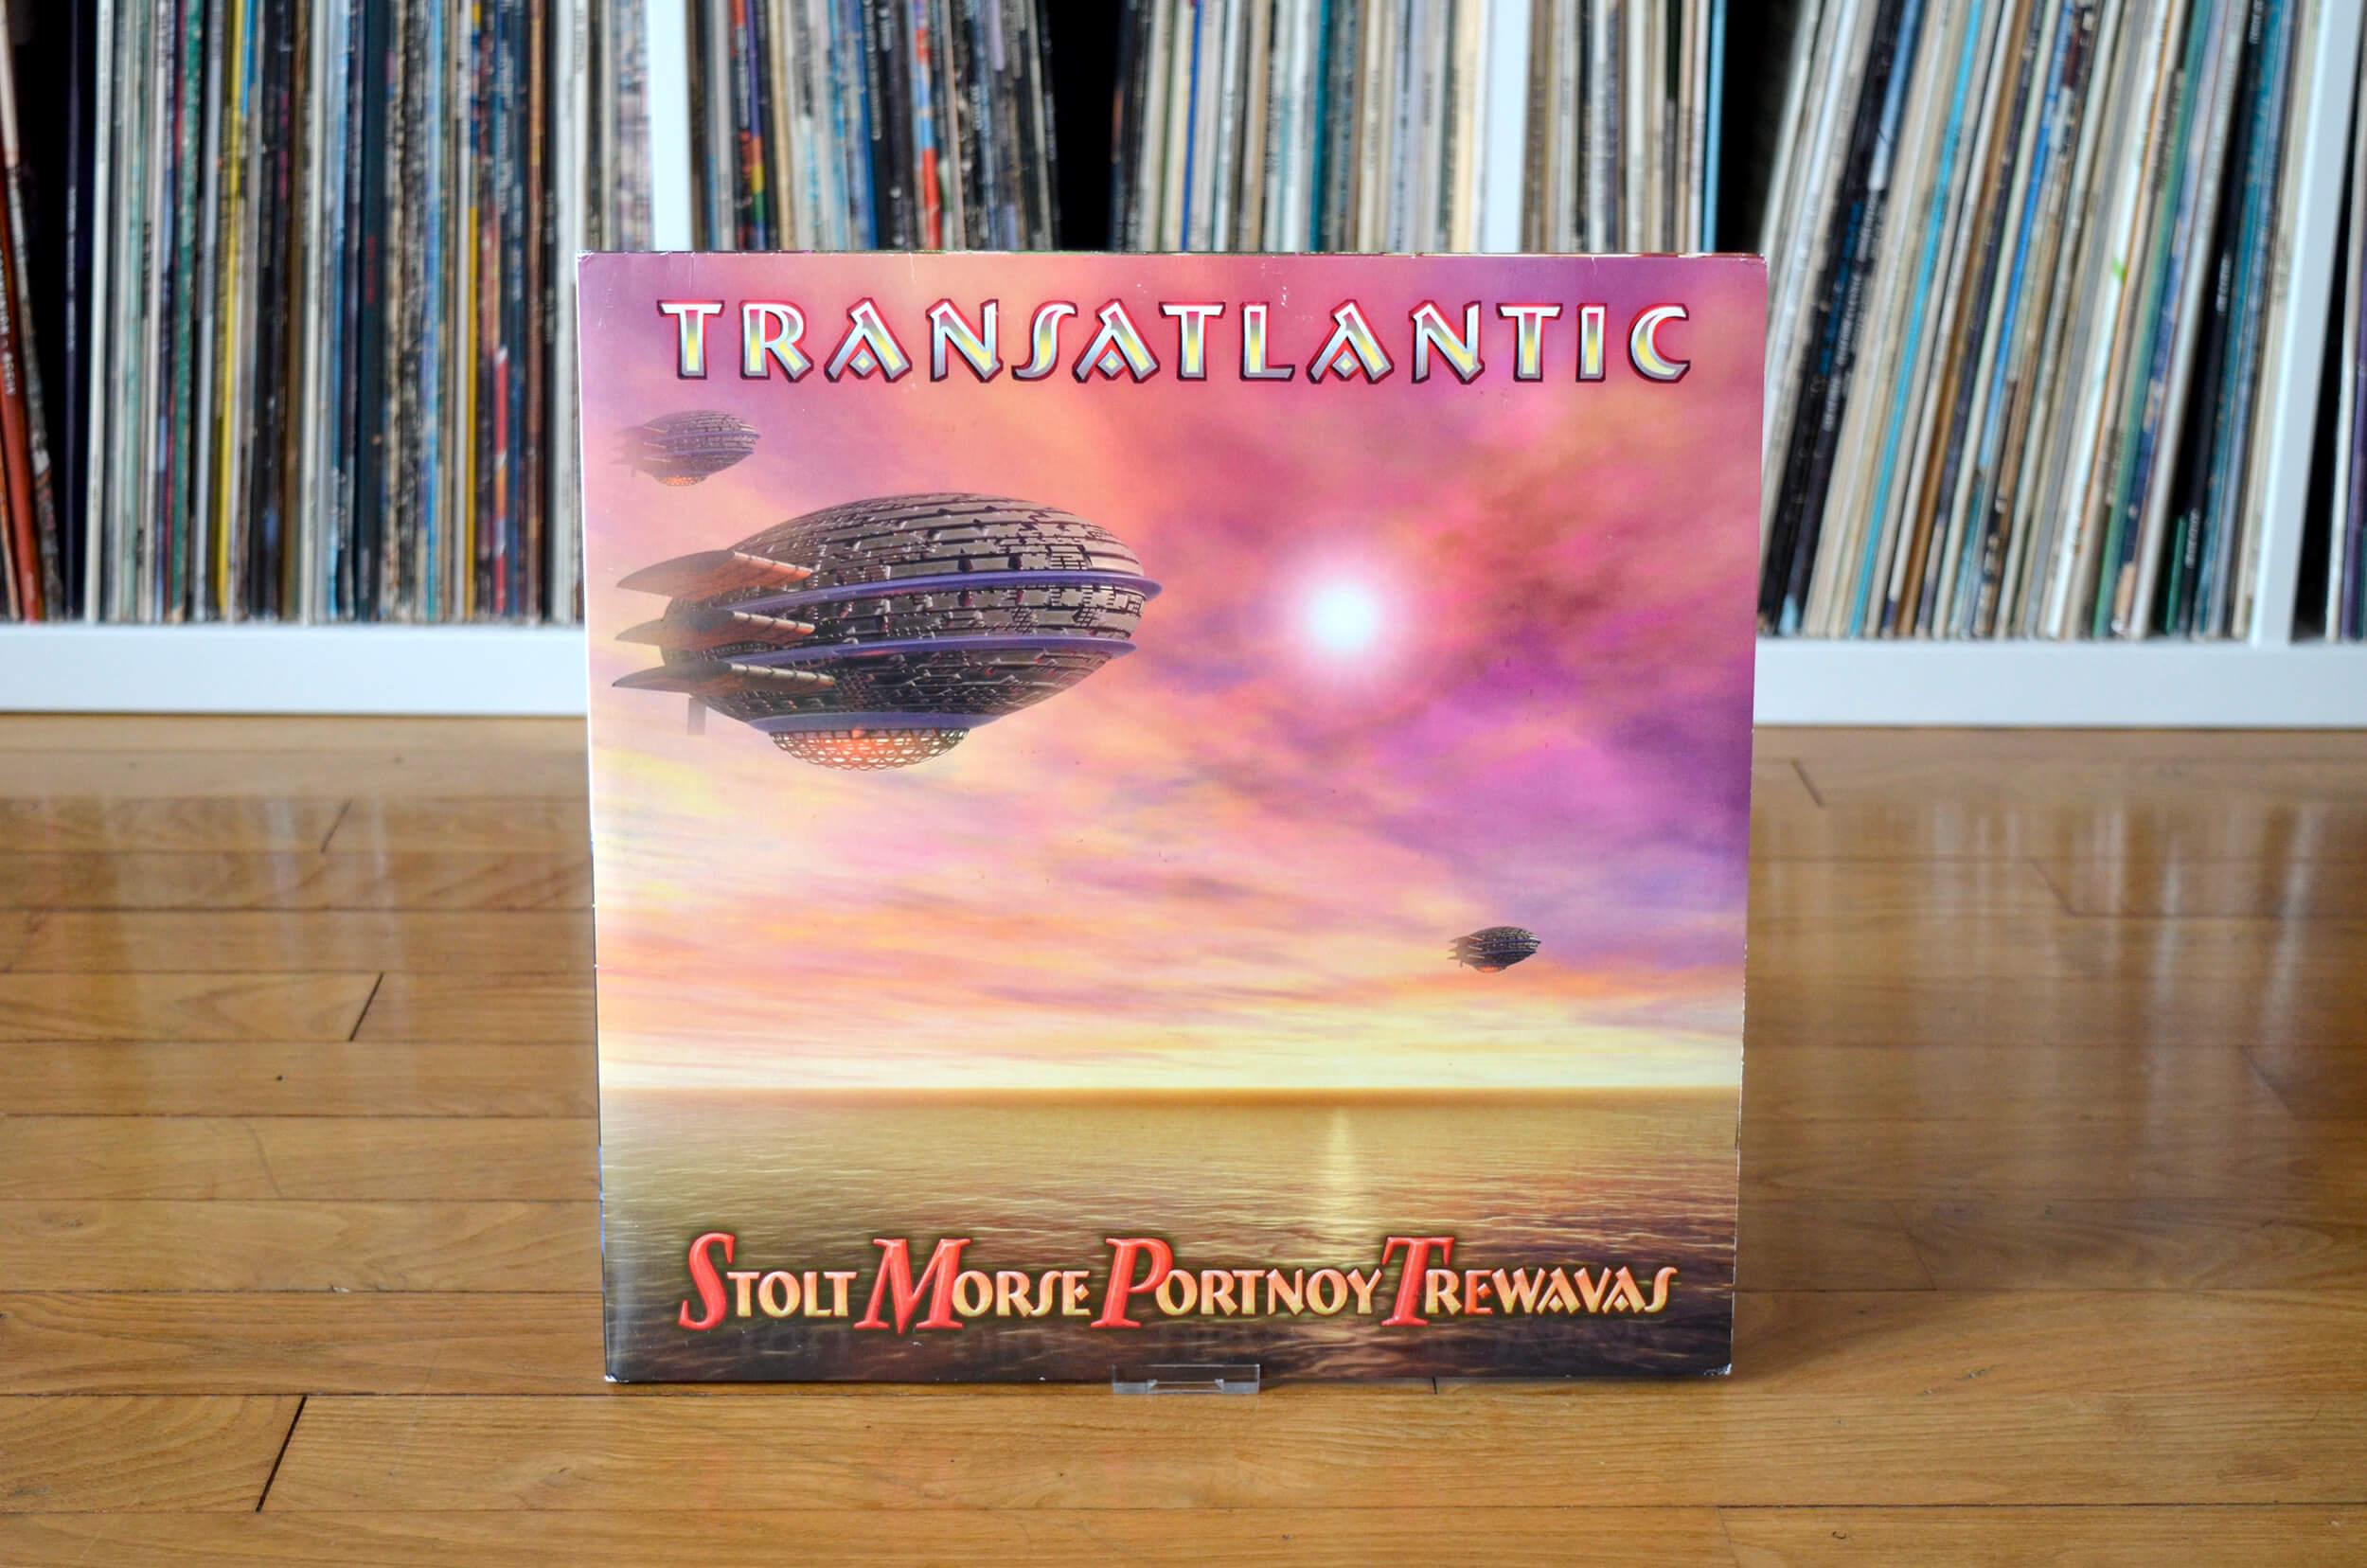 Transatlantic - SMPT:e